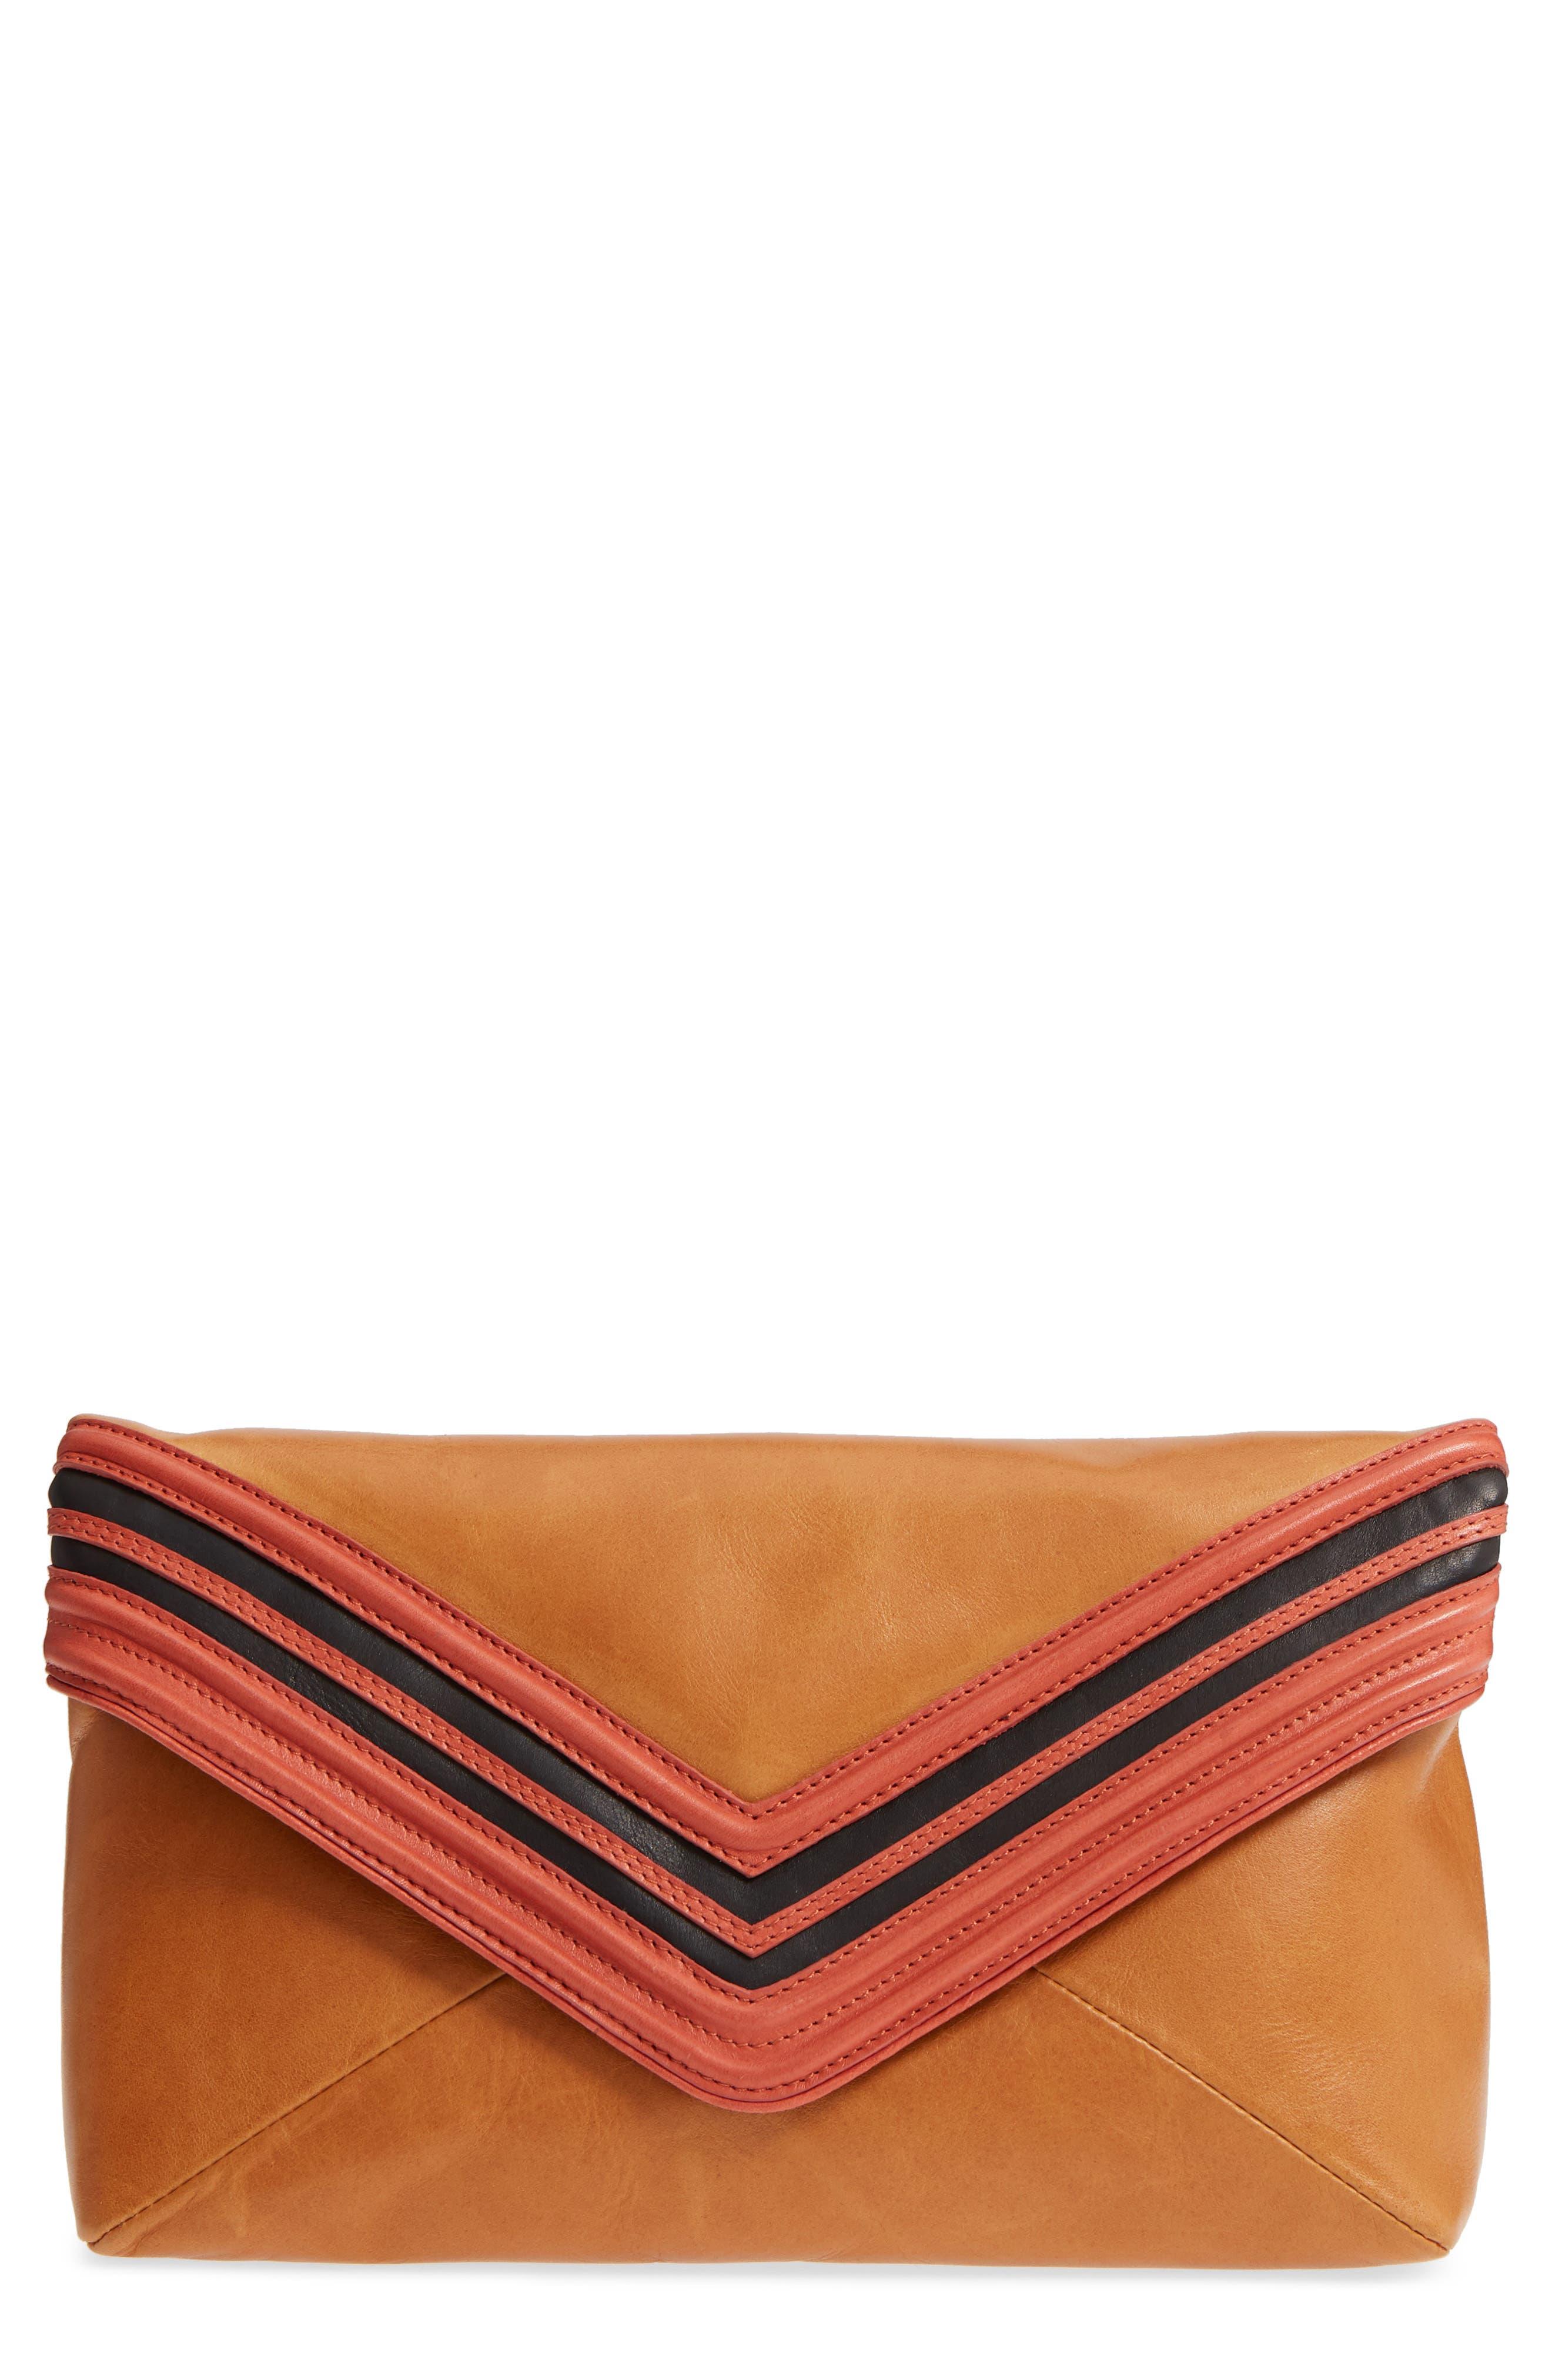 Leather Envelope Clutch,                         Main,                         color, CAMEL